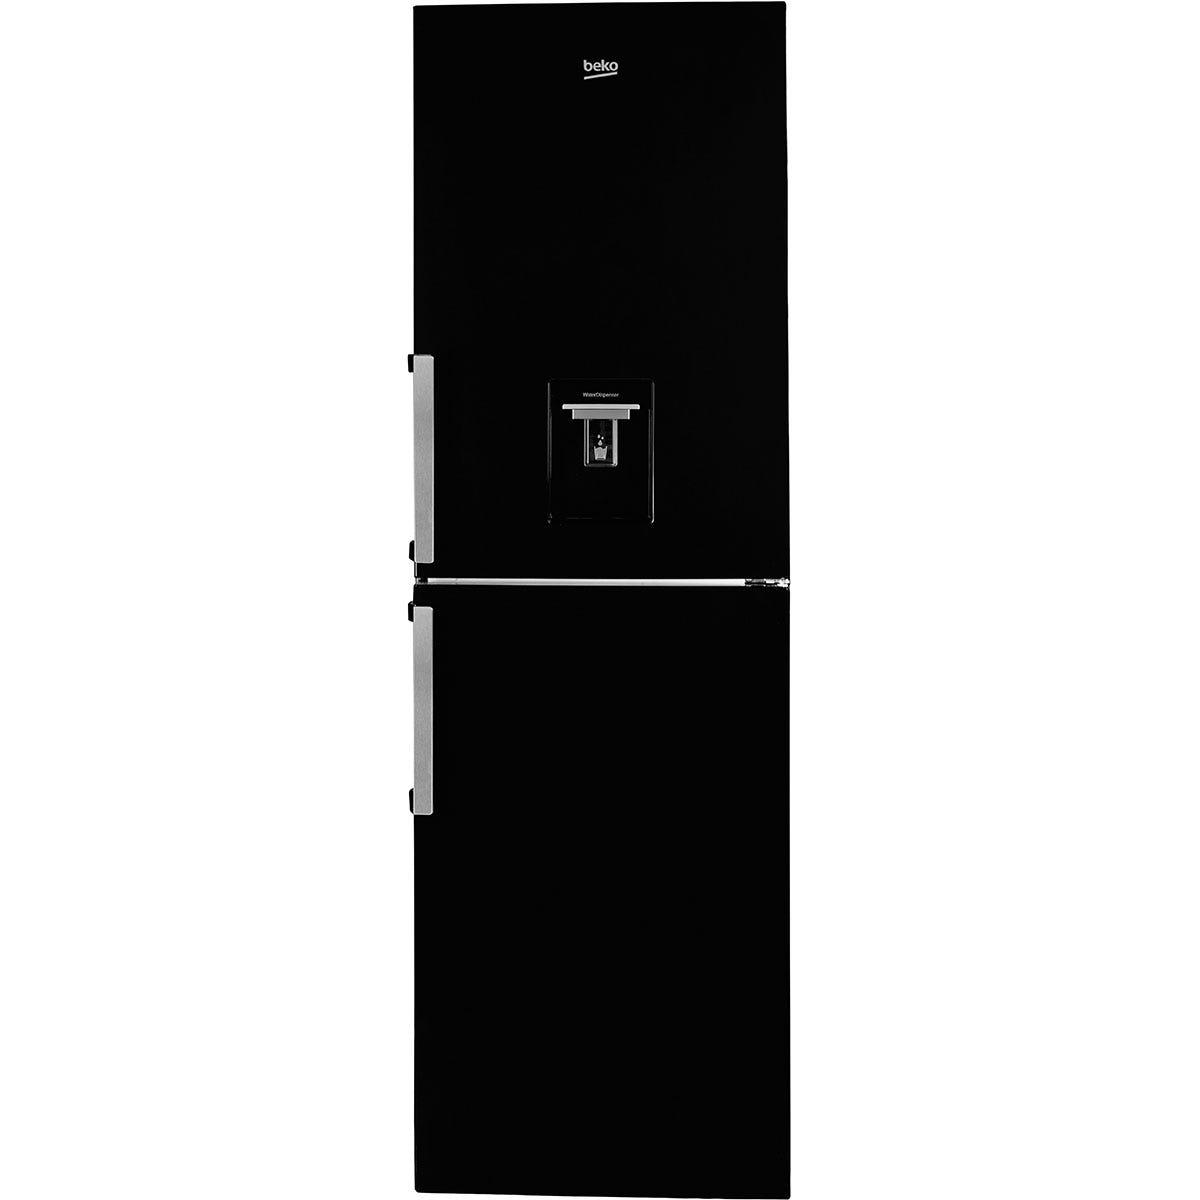 Beko CFP1691DB Frost-Free 313L Freestanding Combi Fridge Freezer - Black